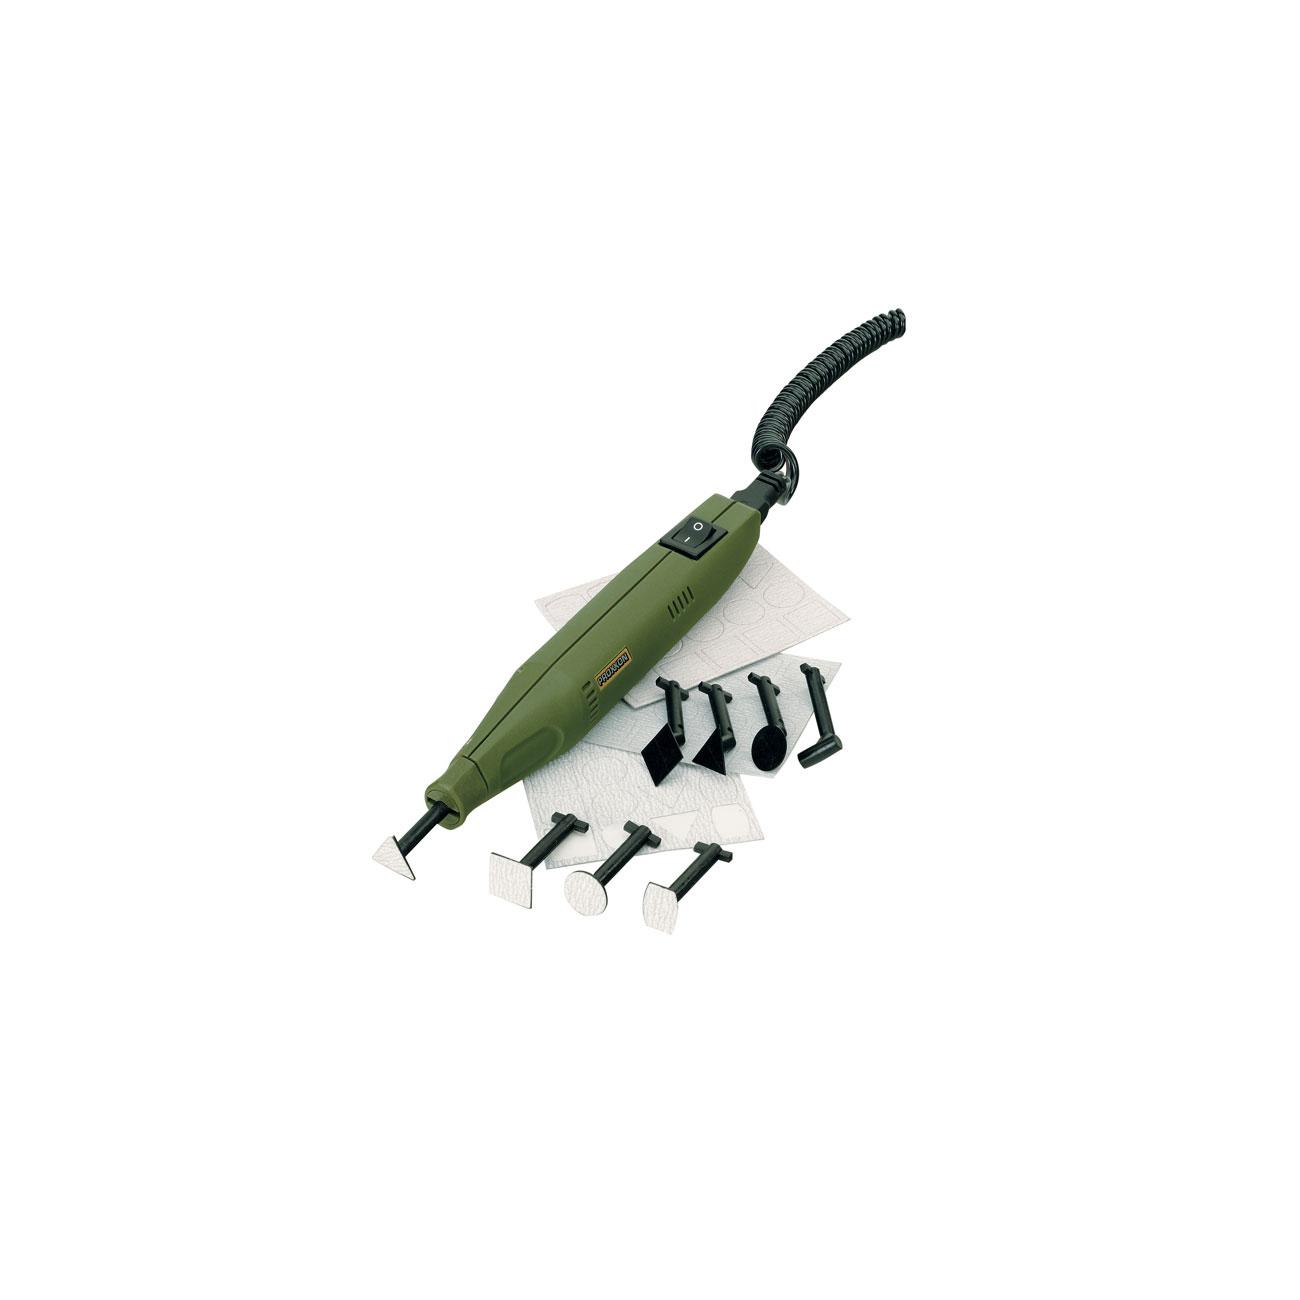 Ponceuse à stylet Proxxon 28594 MicroMot PS 13